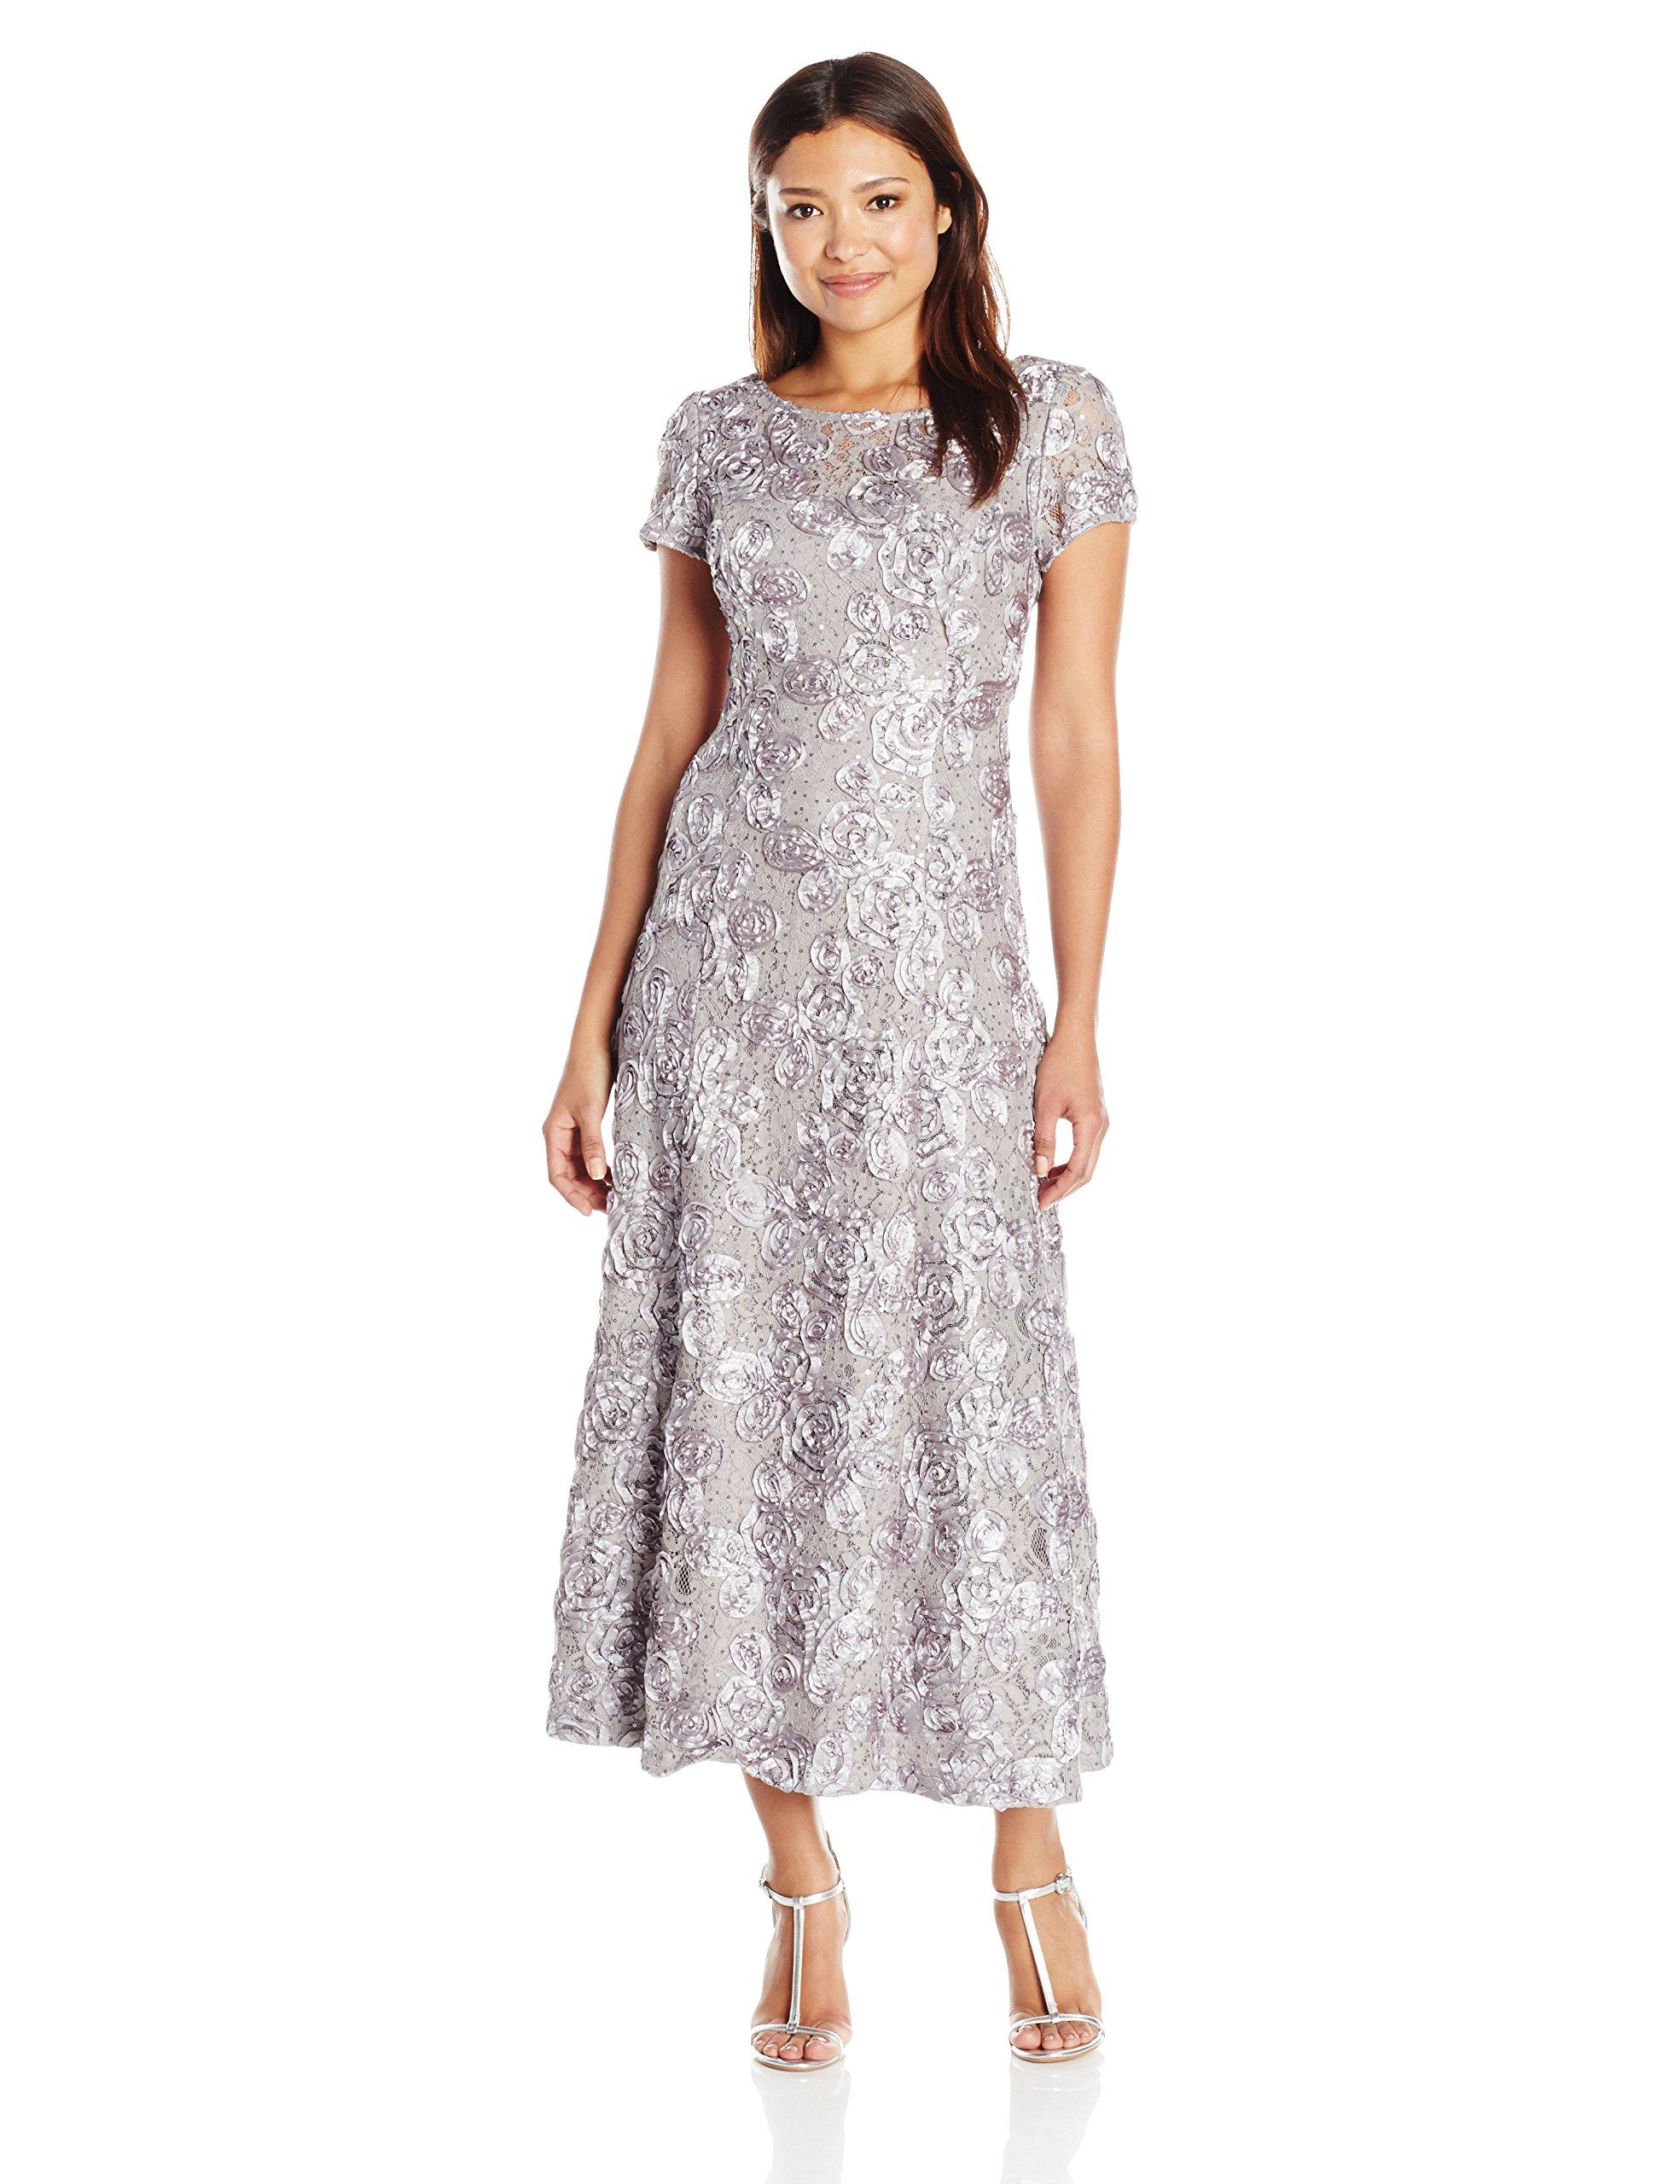 Alex Evenings Women's 16P Long A-Line Rosette Dress with Short Sleeves Sequin Detail, Dove, 16P